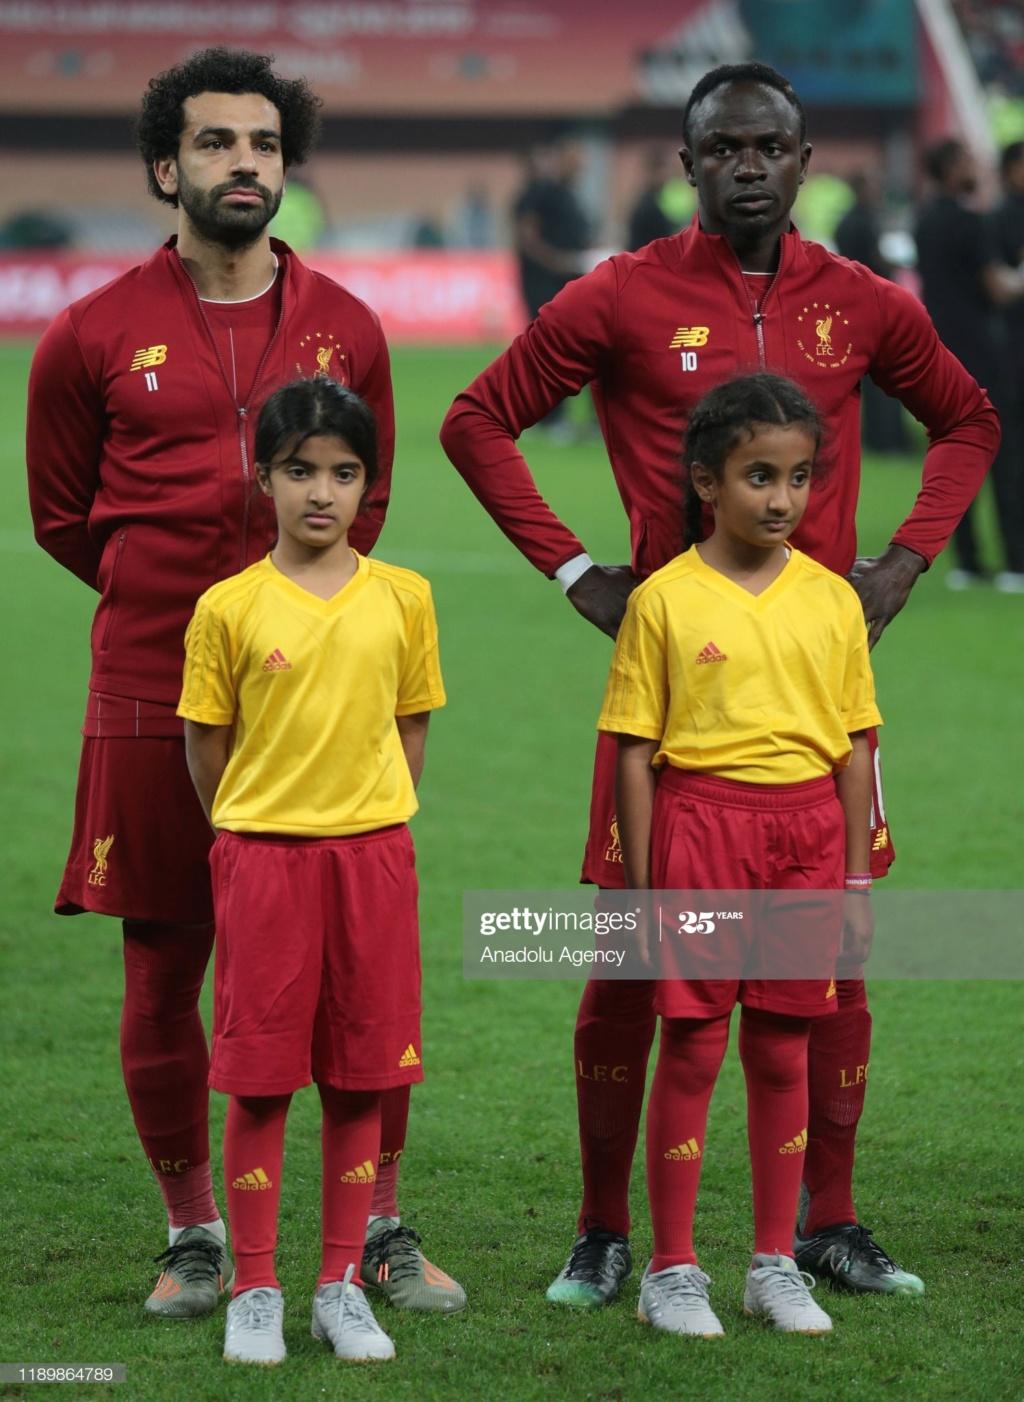 ¿Cuánto mide Mohamed Salah? - Altura - Real height - Página 2 Gettyi12